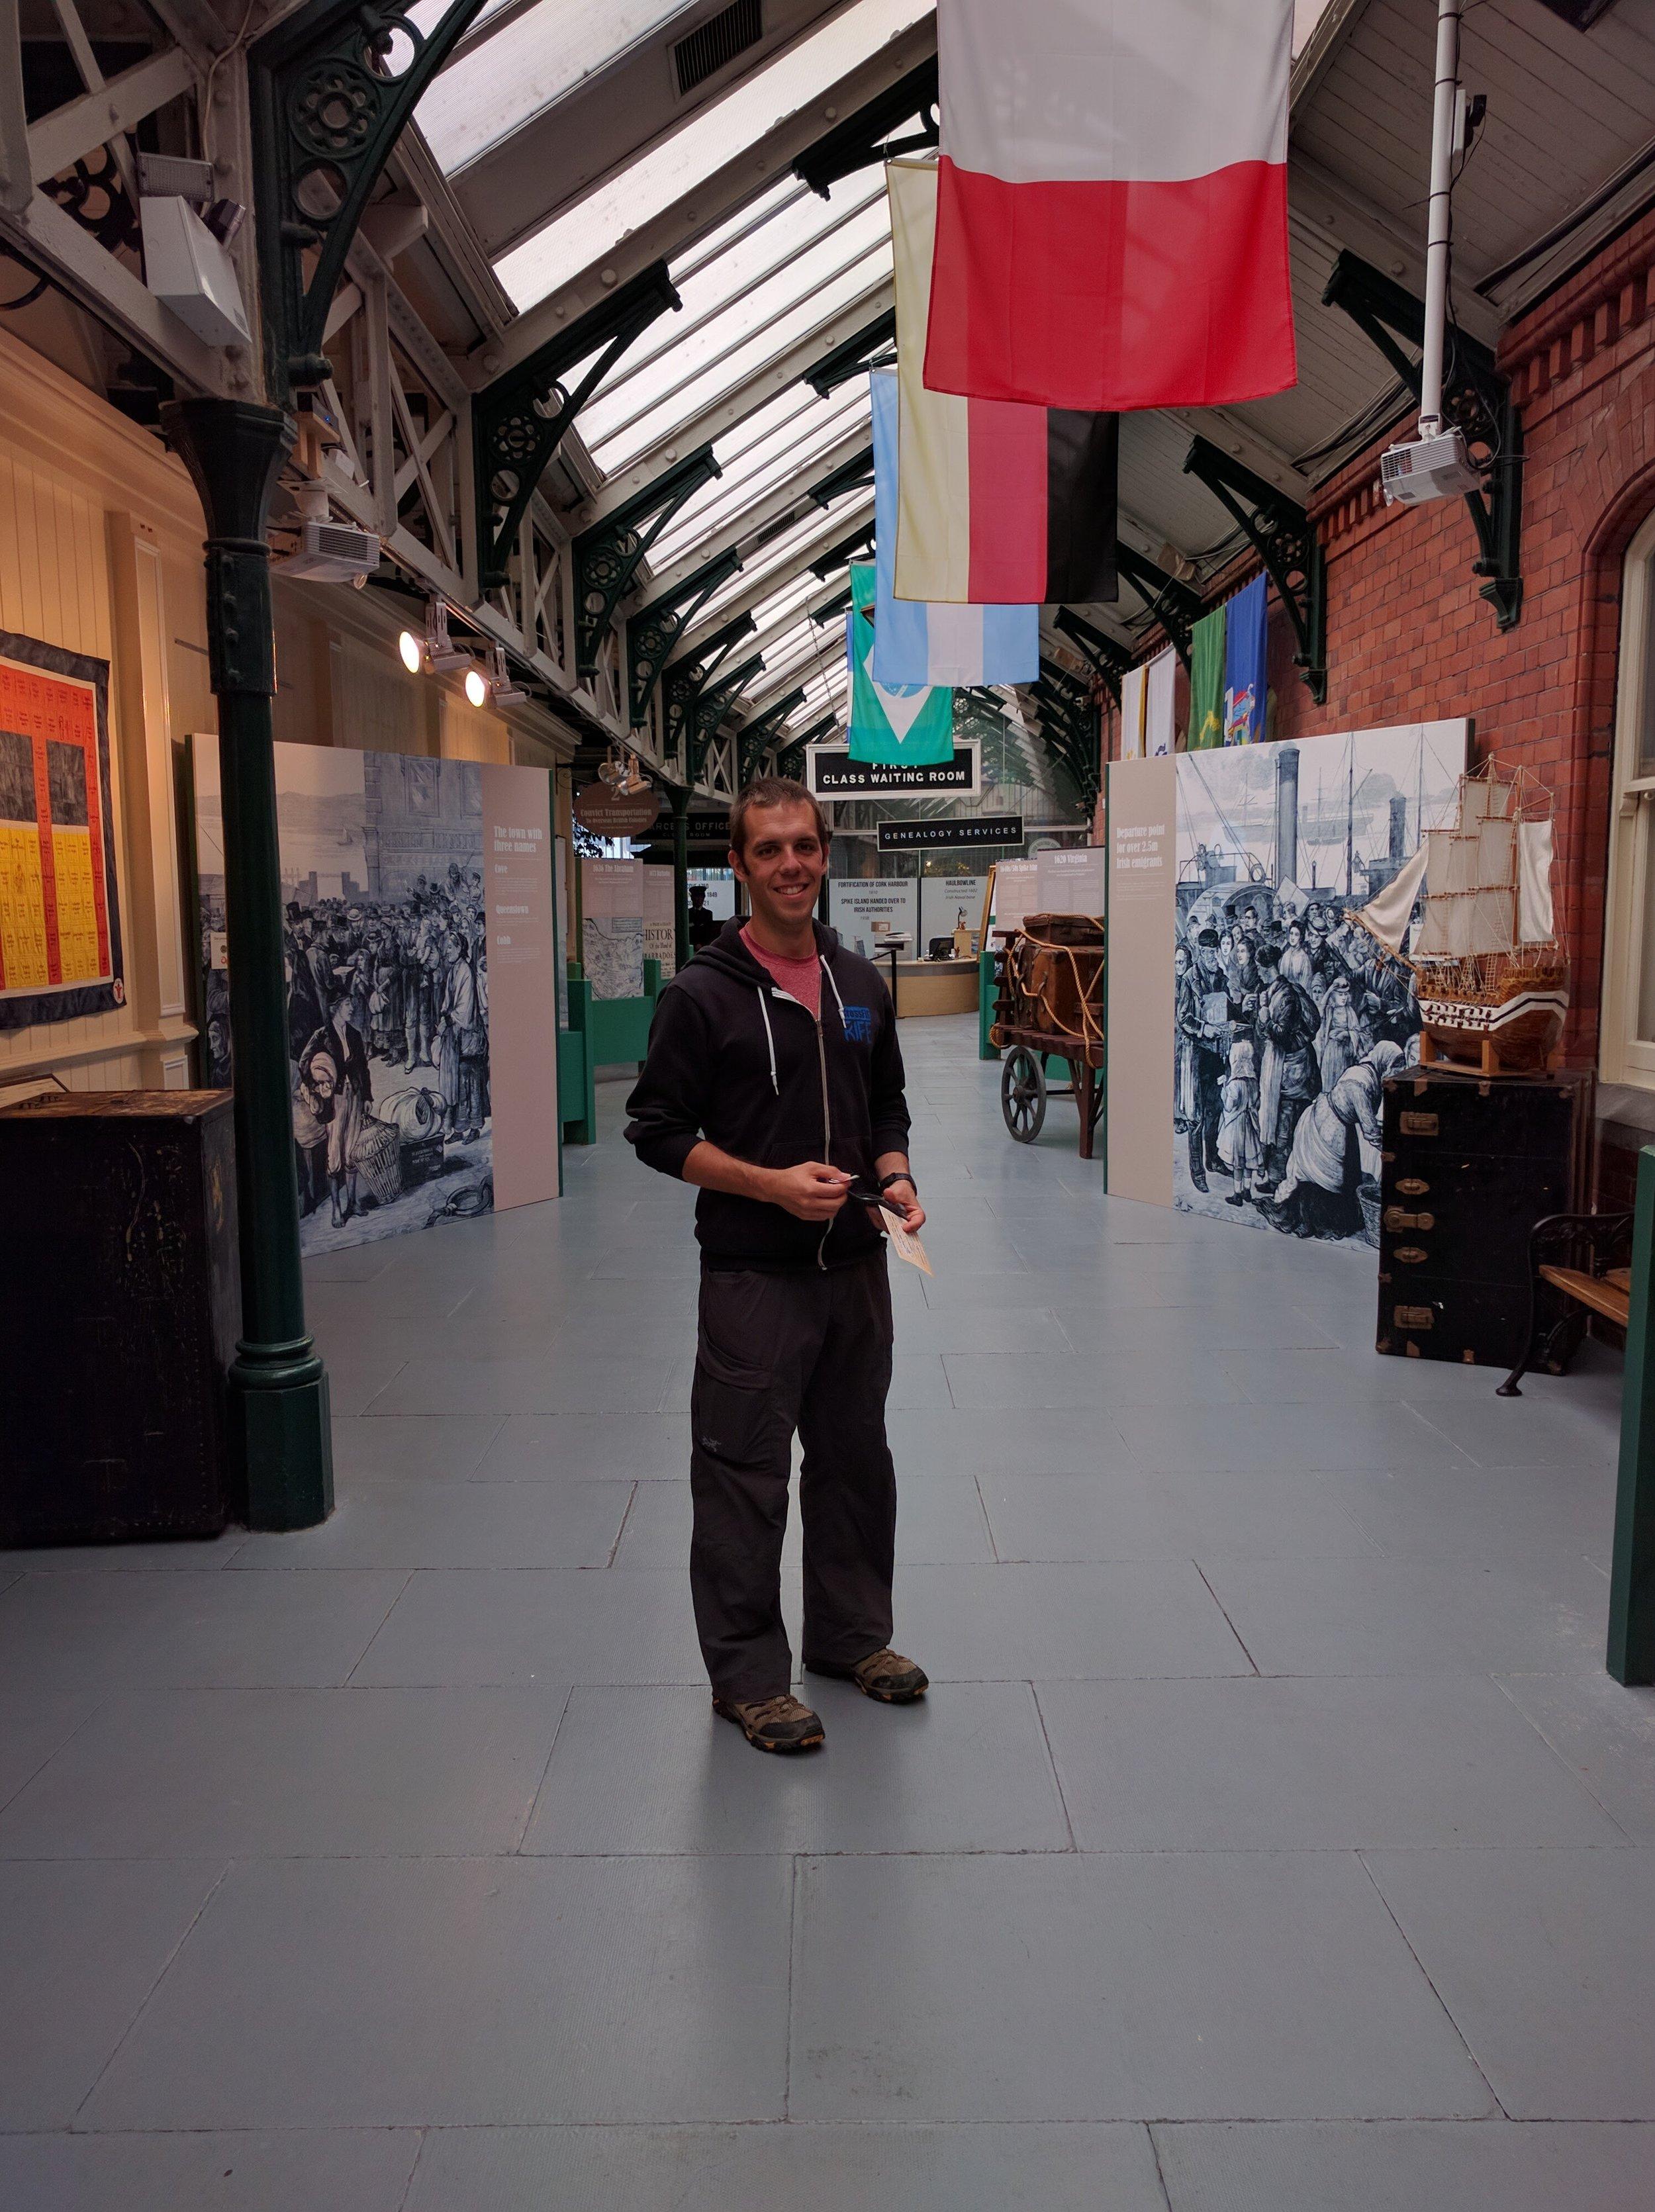 Queenstown Heritage Center- well worth a visit!